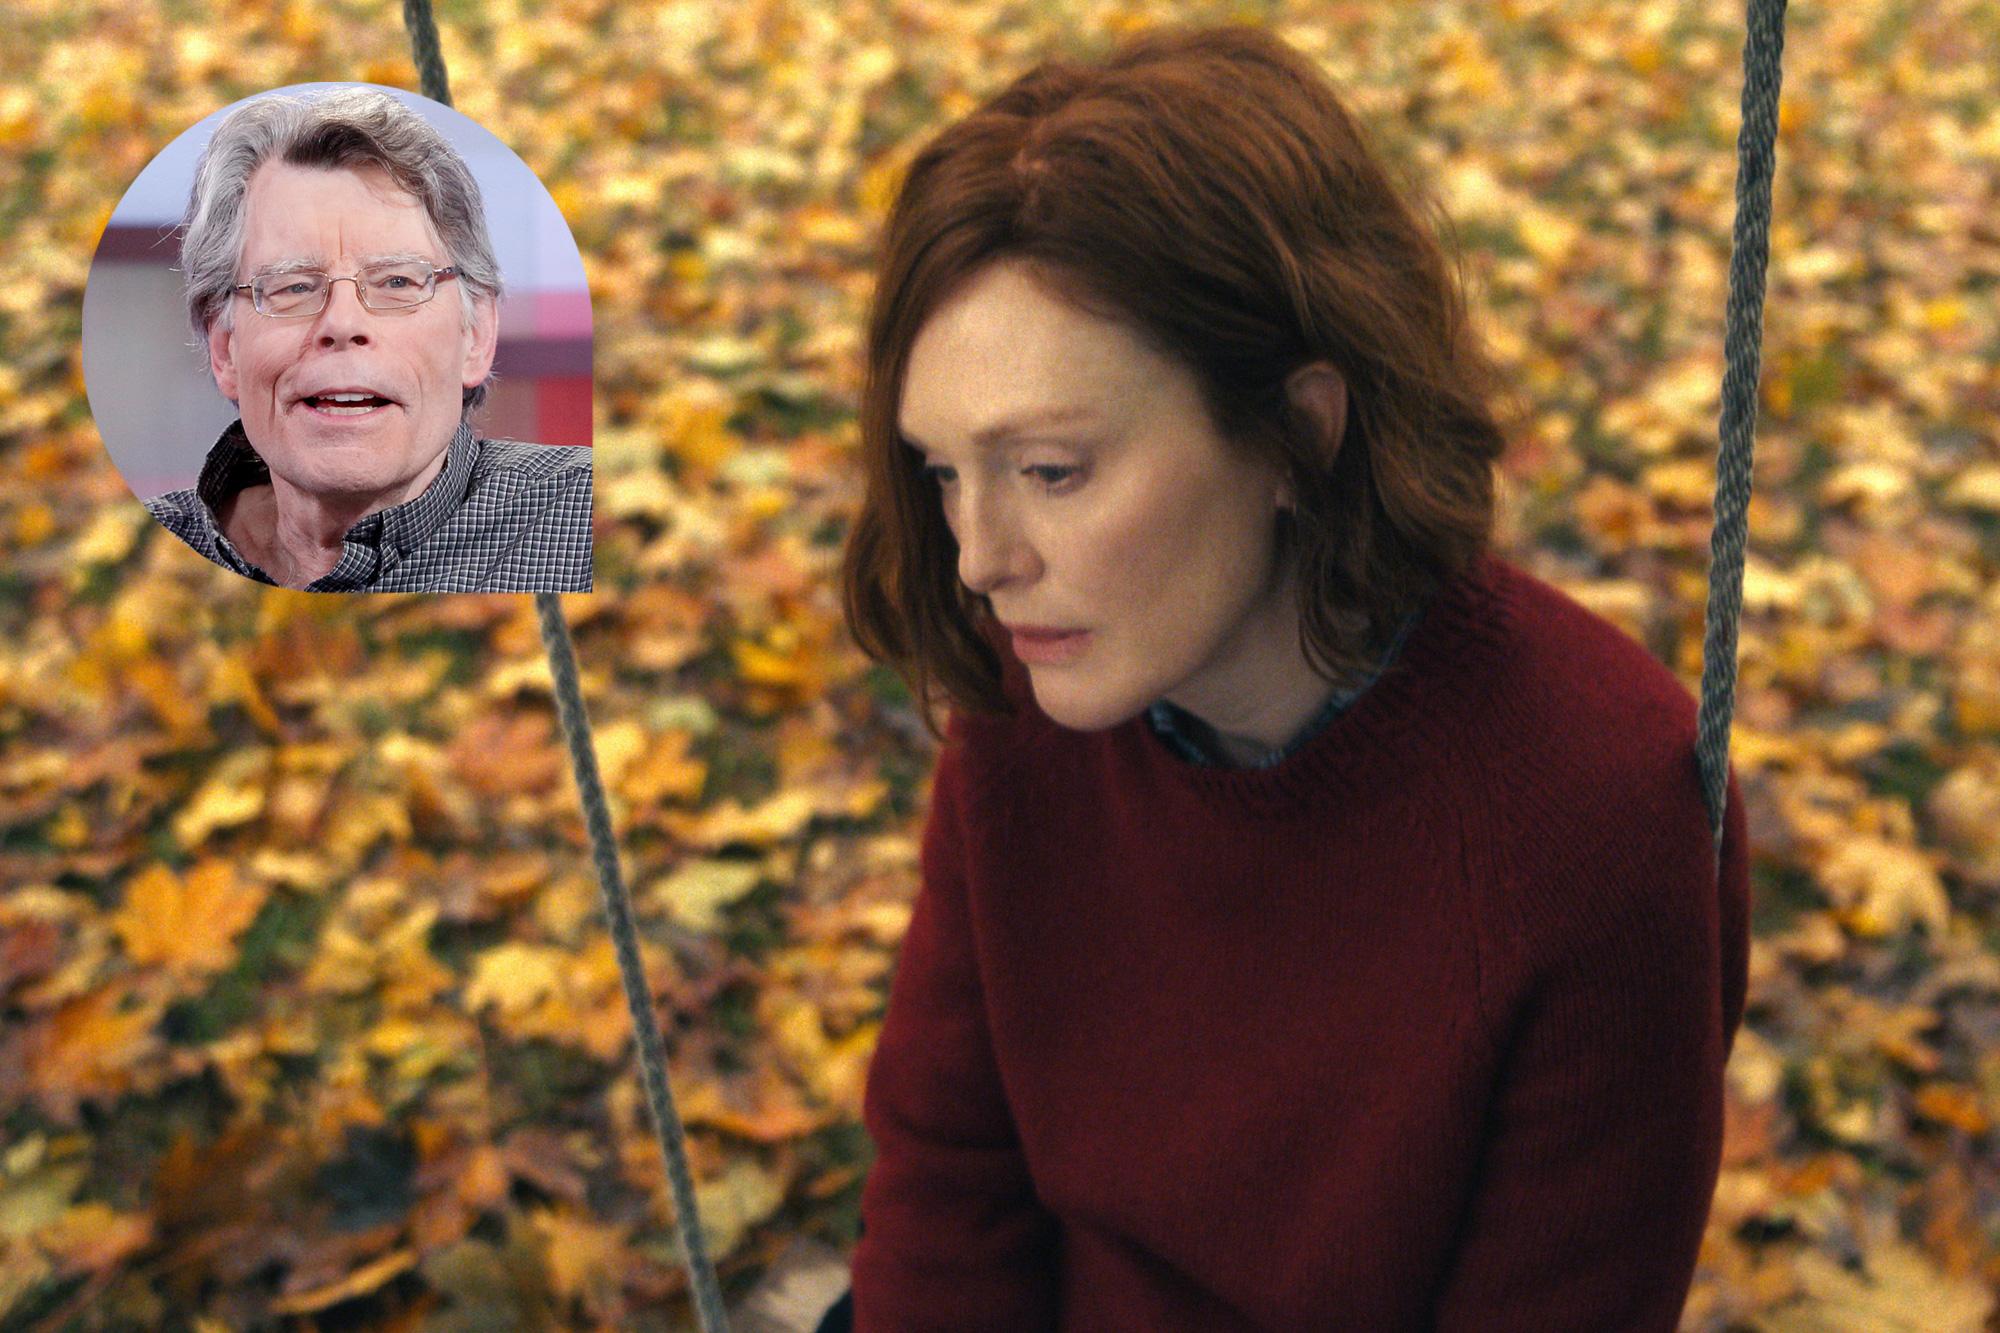 Lisey's Story, Stephen King